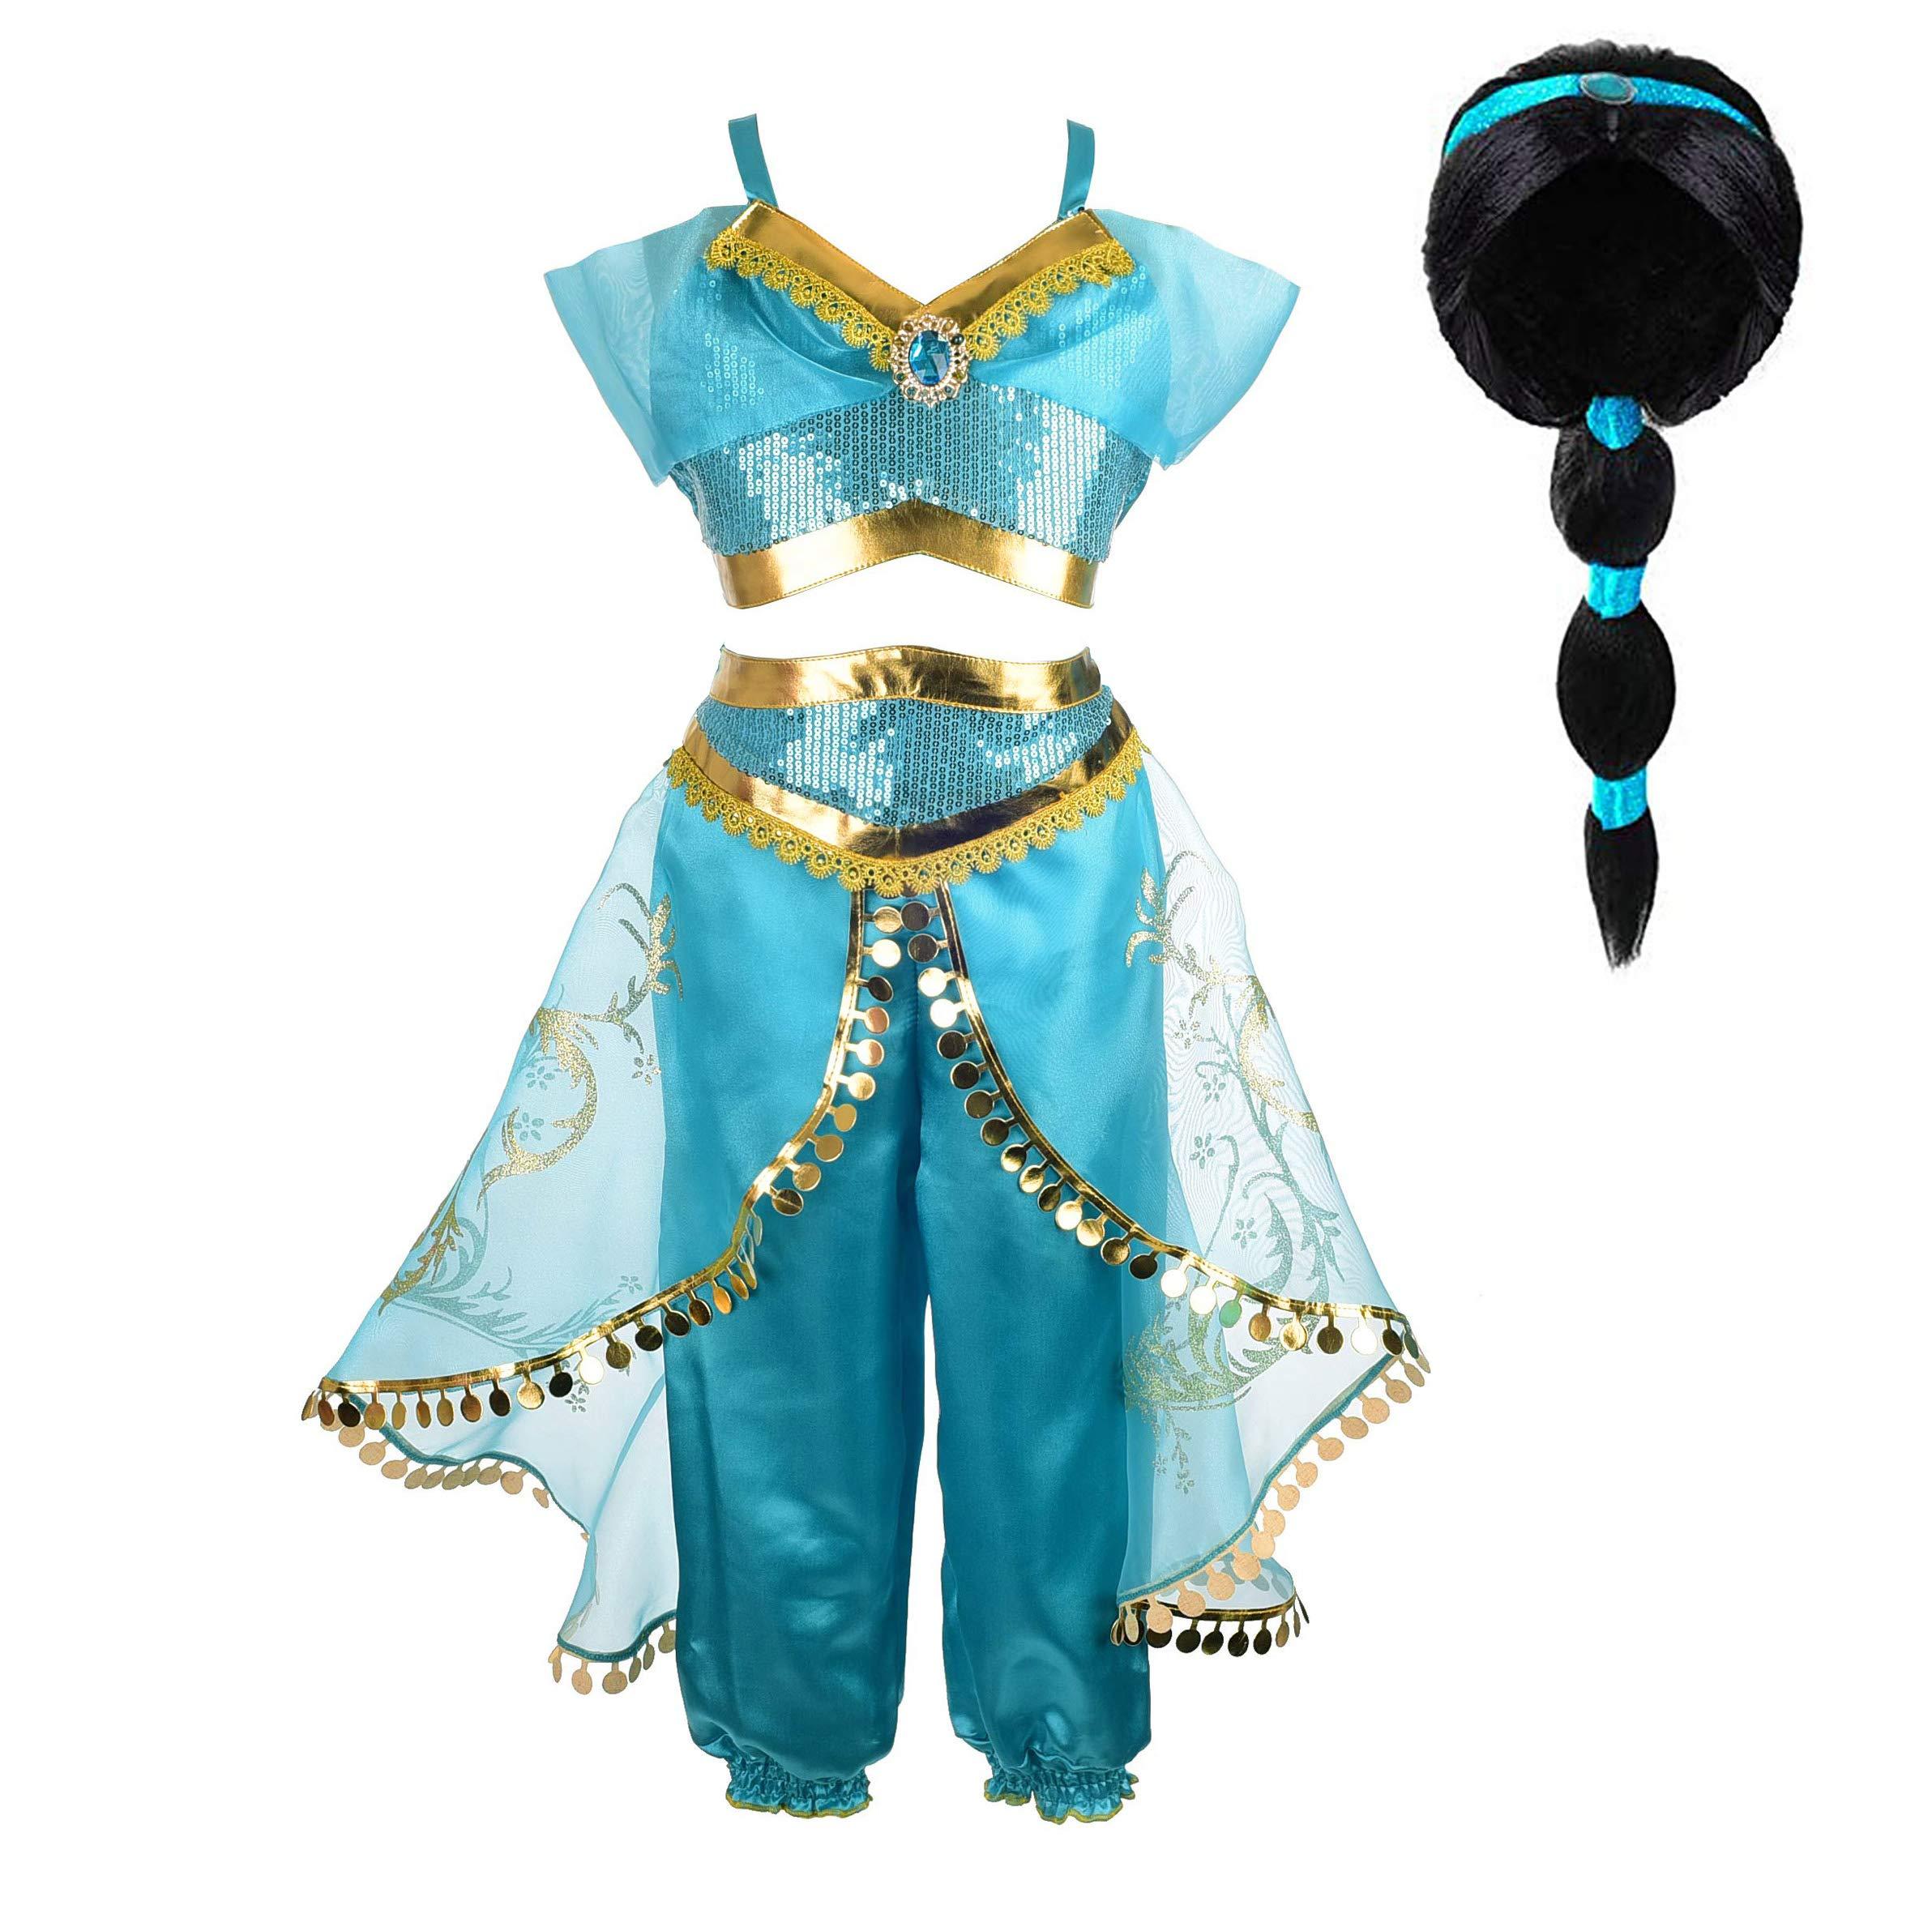 Tacobear Princess Jasmine Costume for Girls Arabian Sequined Jasmine Dress up with Wig Tiara Wand Cosplay for Kids (130(5-6T), 01 Jasmine Costume with Wig)